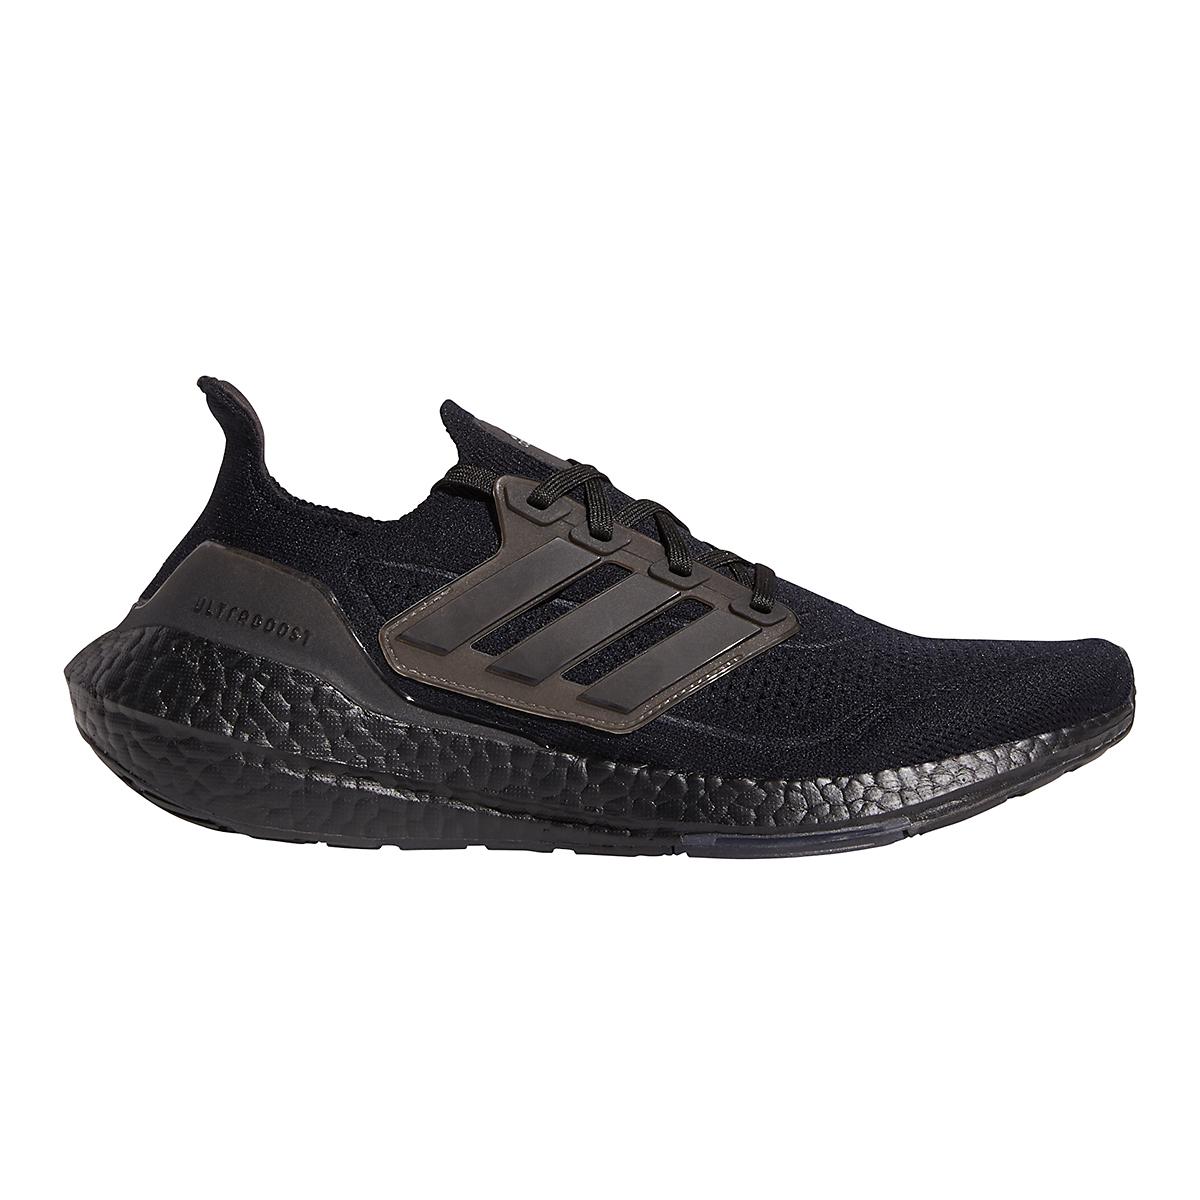 Men's Adidas Ultraboost 21 Running Shoe - Color: Core Black - Size: 5 - Width: Regular, Core Black, large, image 1